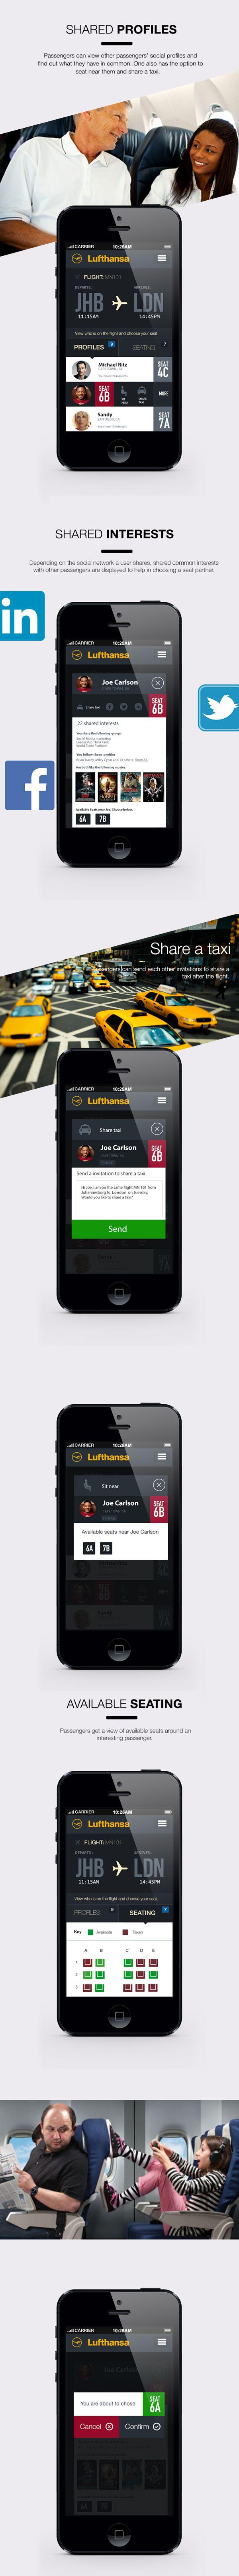 Lufthansa - Sky Connect IOS7 app by Calvin Pedzai, via Behance